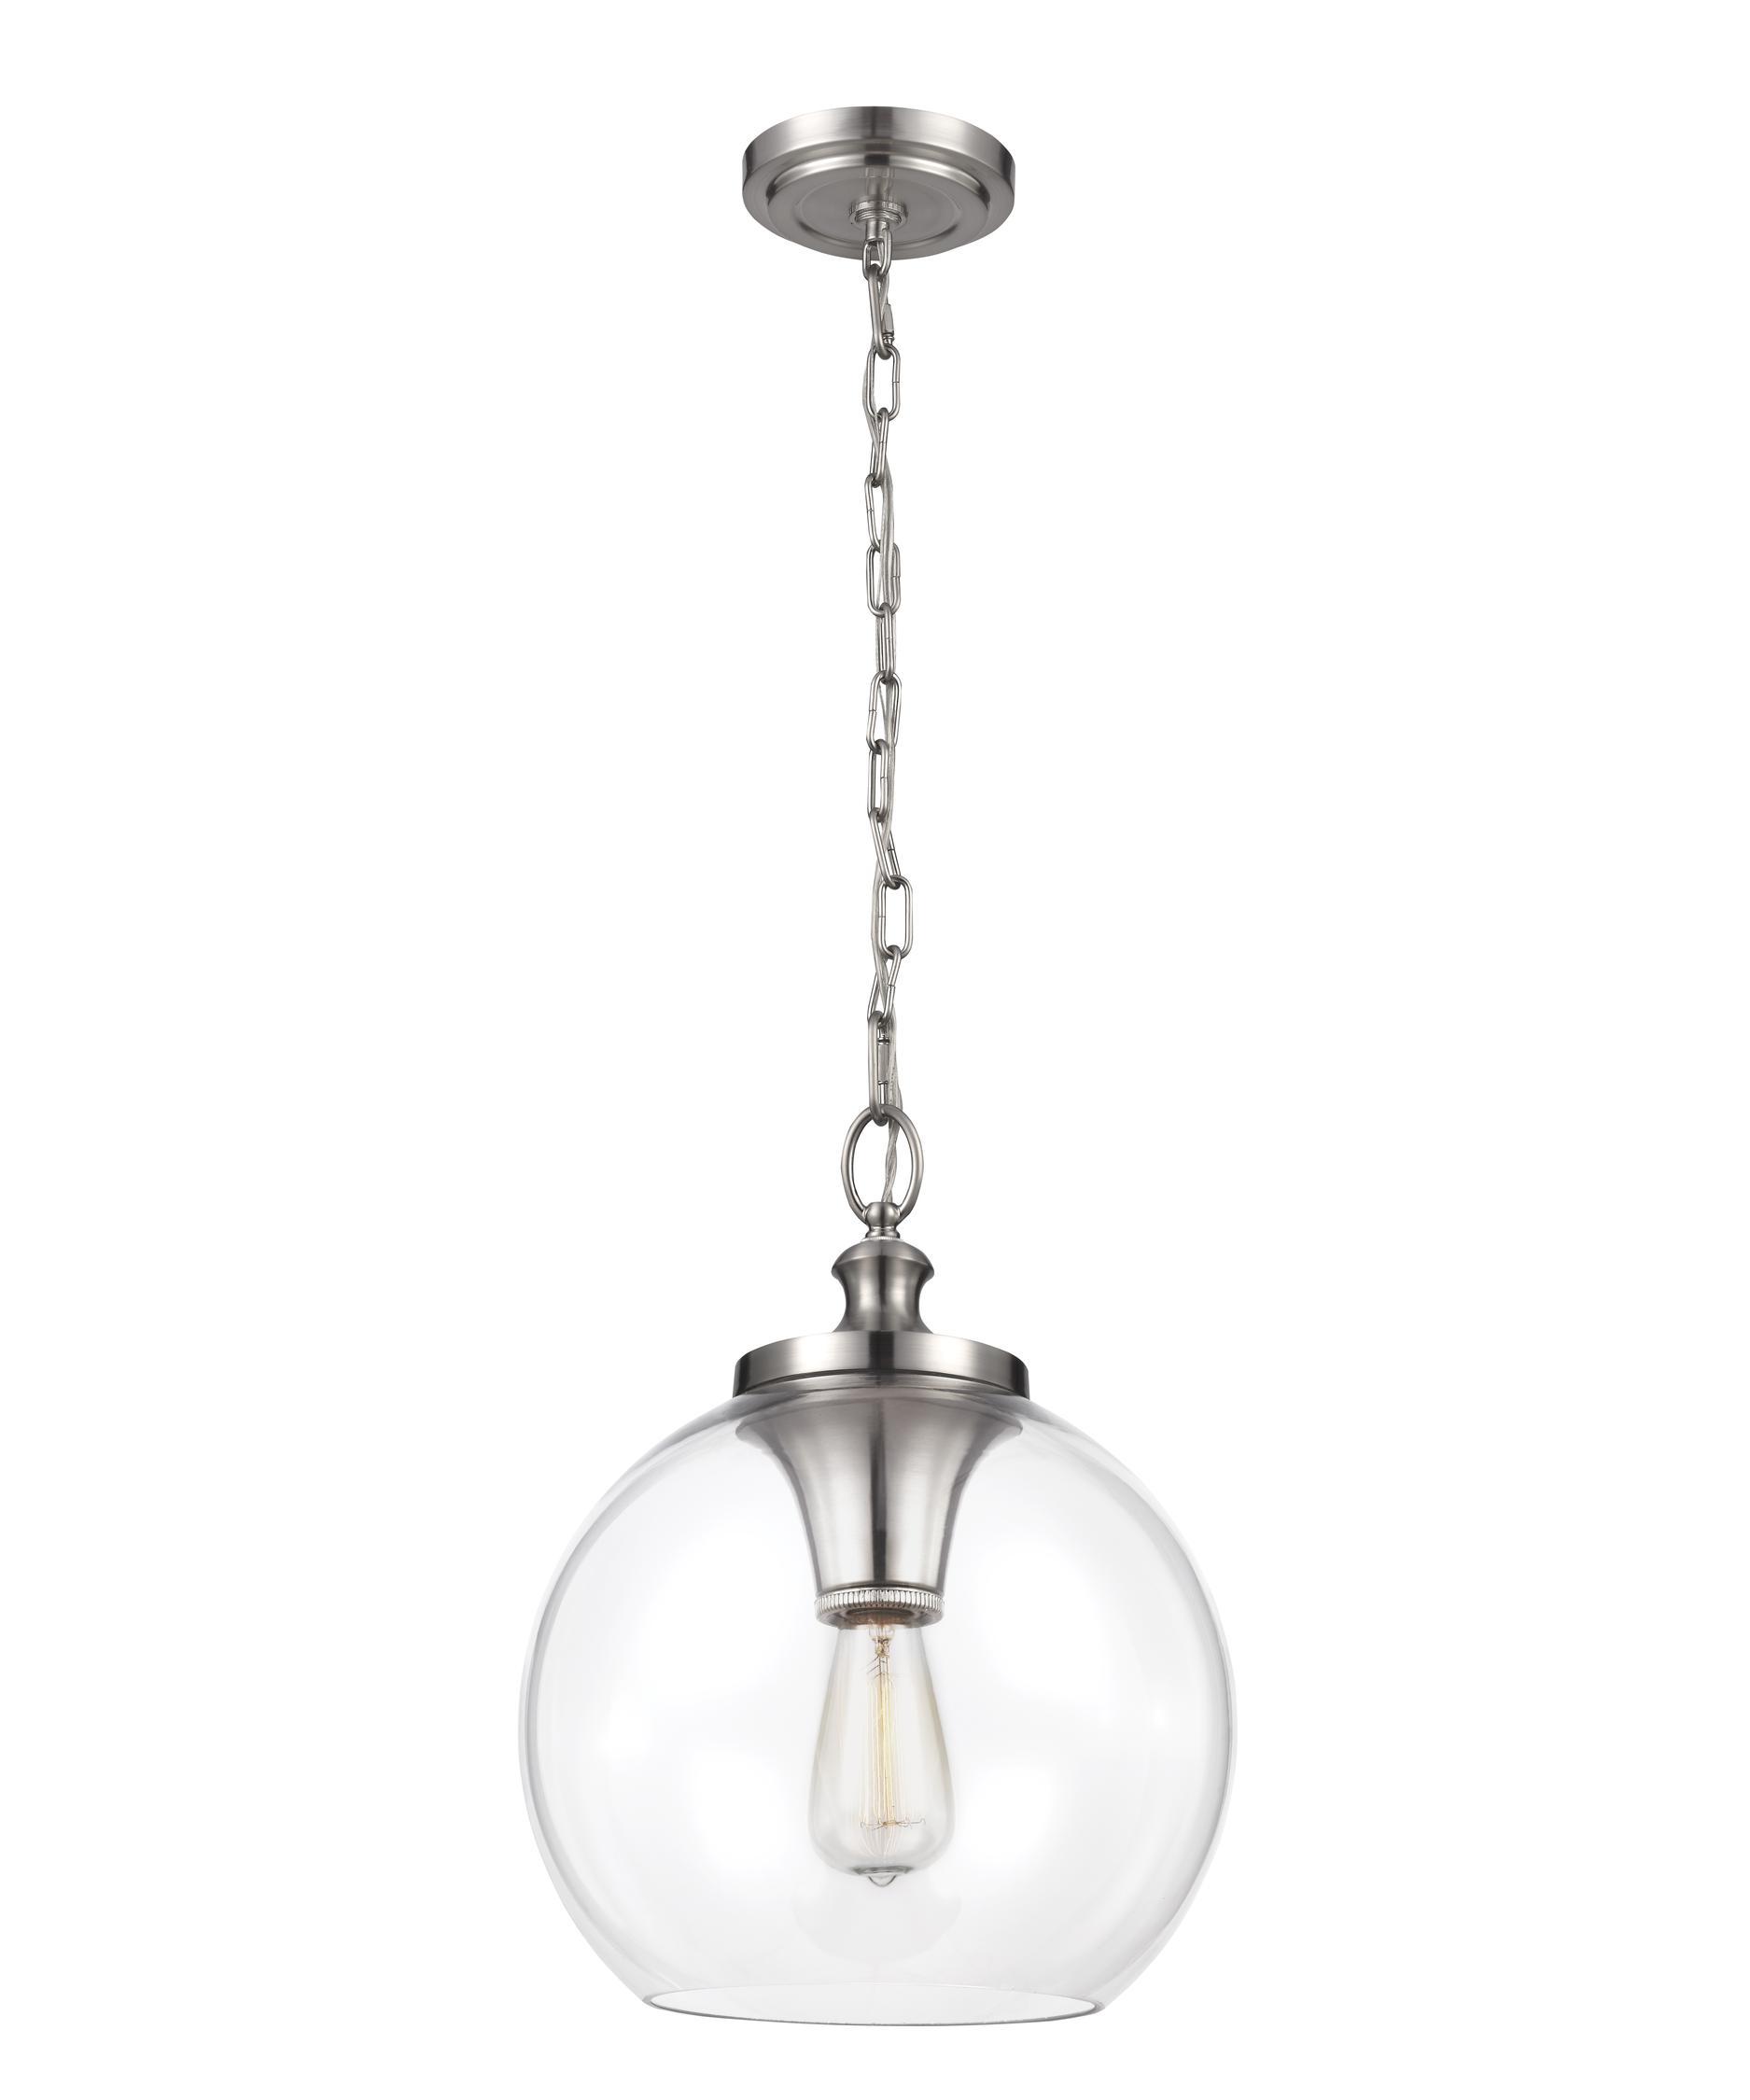 murray feiss p1307 tabby 12 inch wide 1 light large pendant capitol lighting - Feiss Lighting